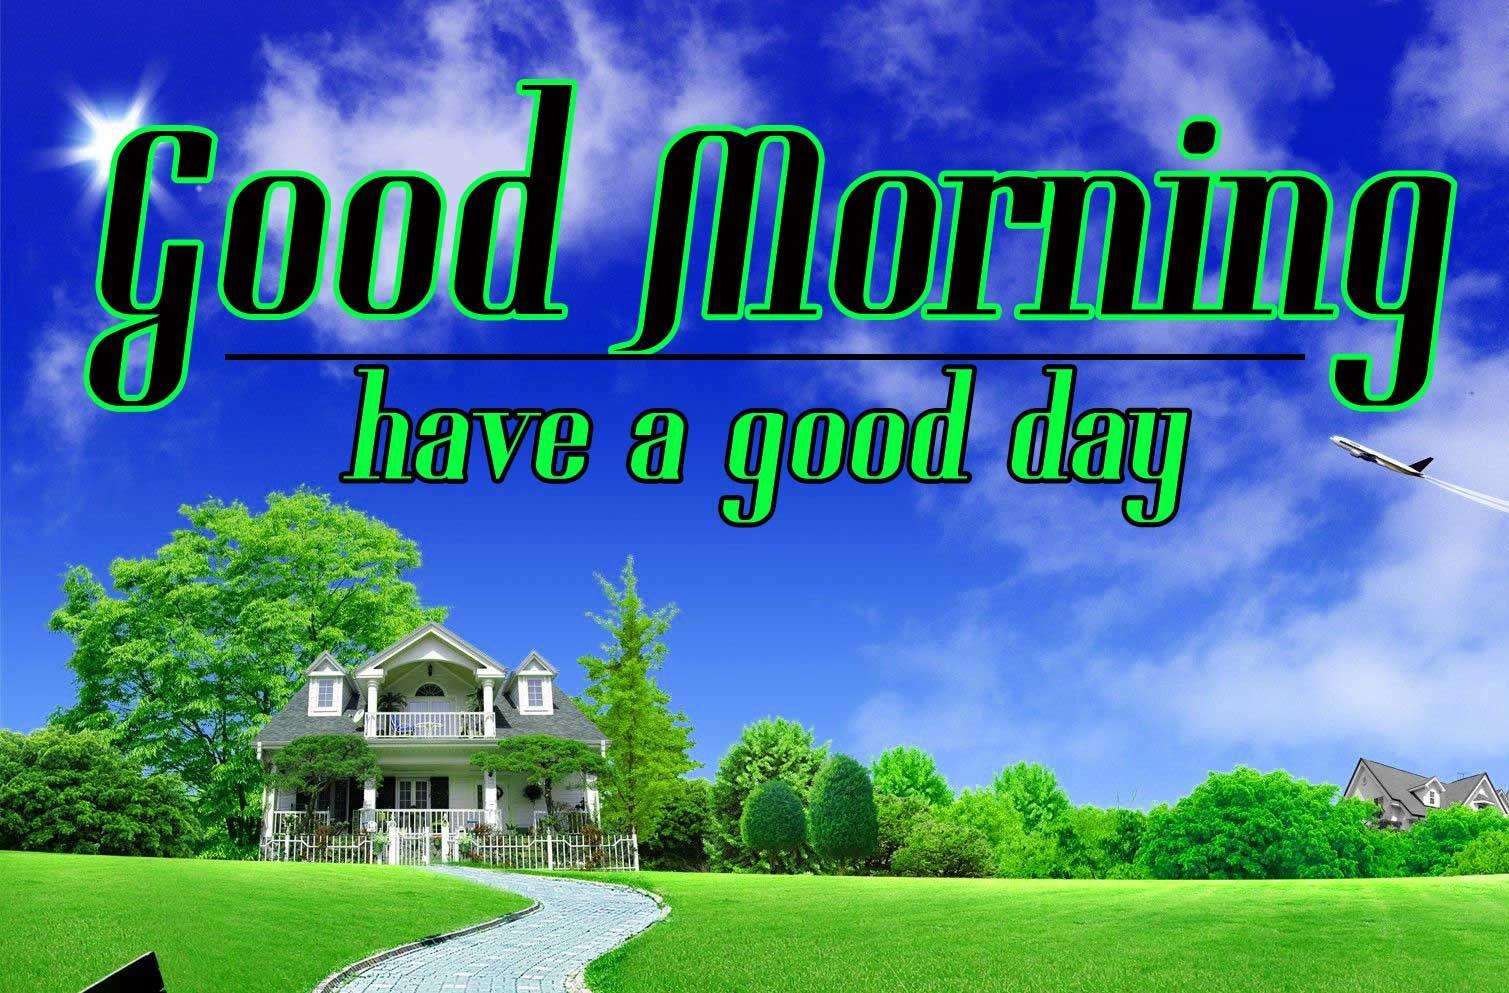 Nature Good Morning Images Pics Hd Download Free Good Morning Images Good Morning Images Good Morning Images Download